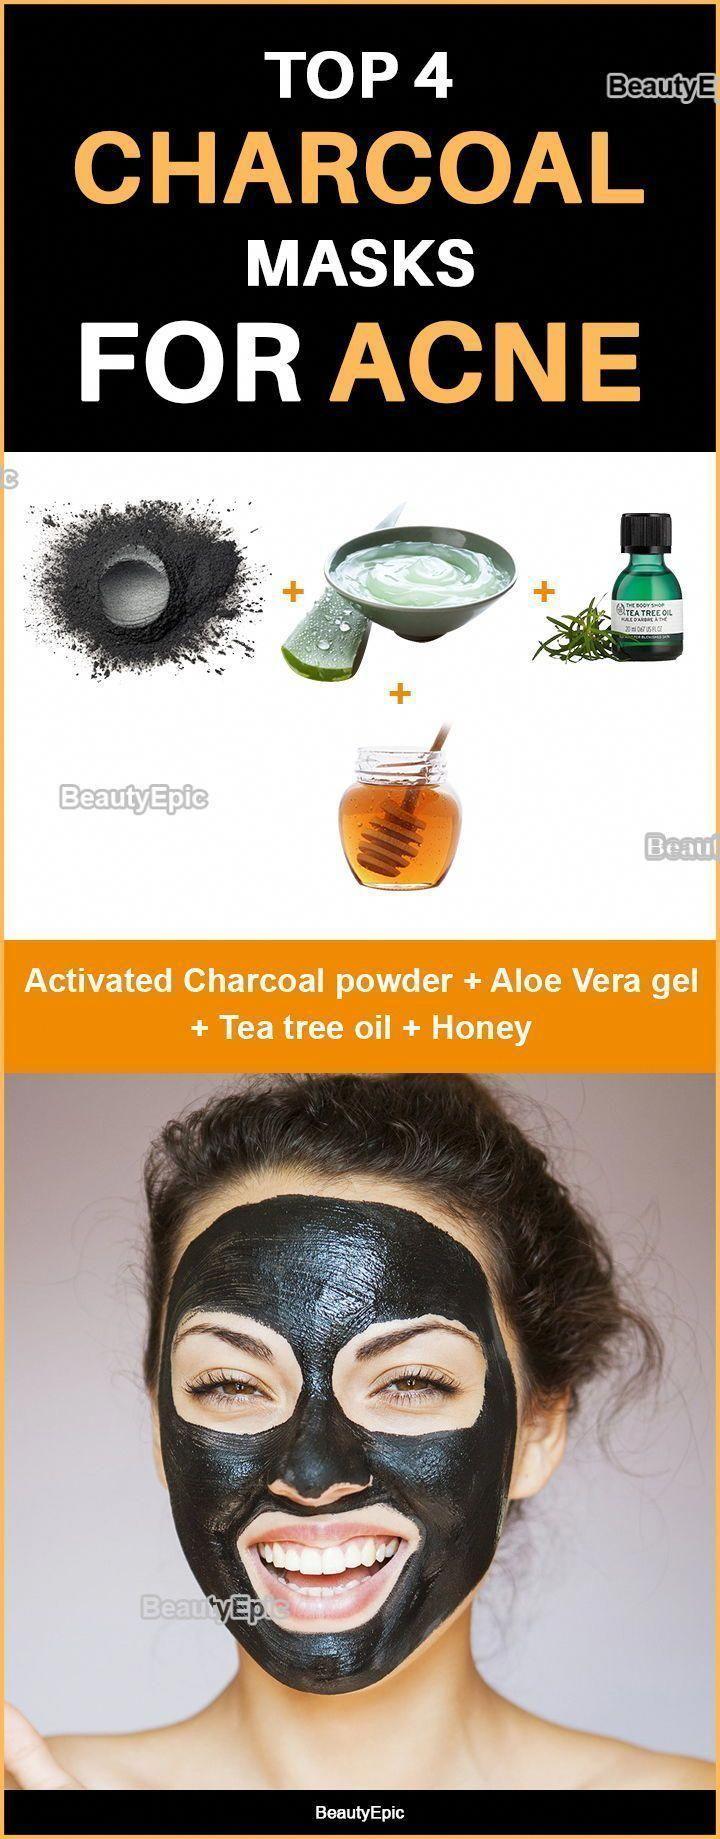 Buy Amazon: amzn.to/31bcjOk # Skin Care Recipes Top 4 charcoal masks for acne -...  -  Hautpflege-Rezepte